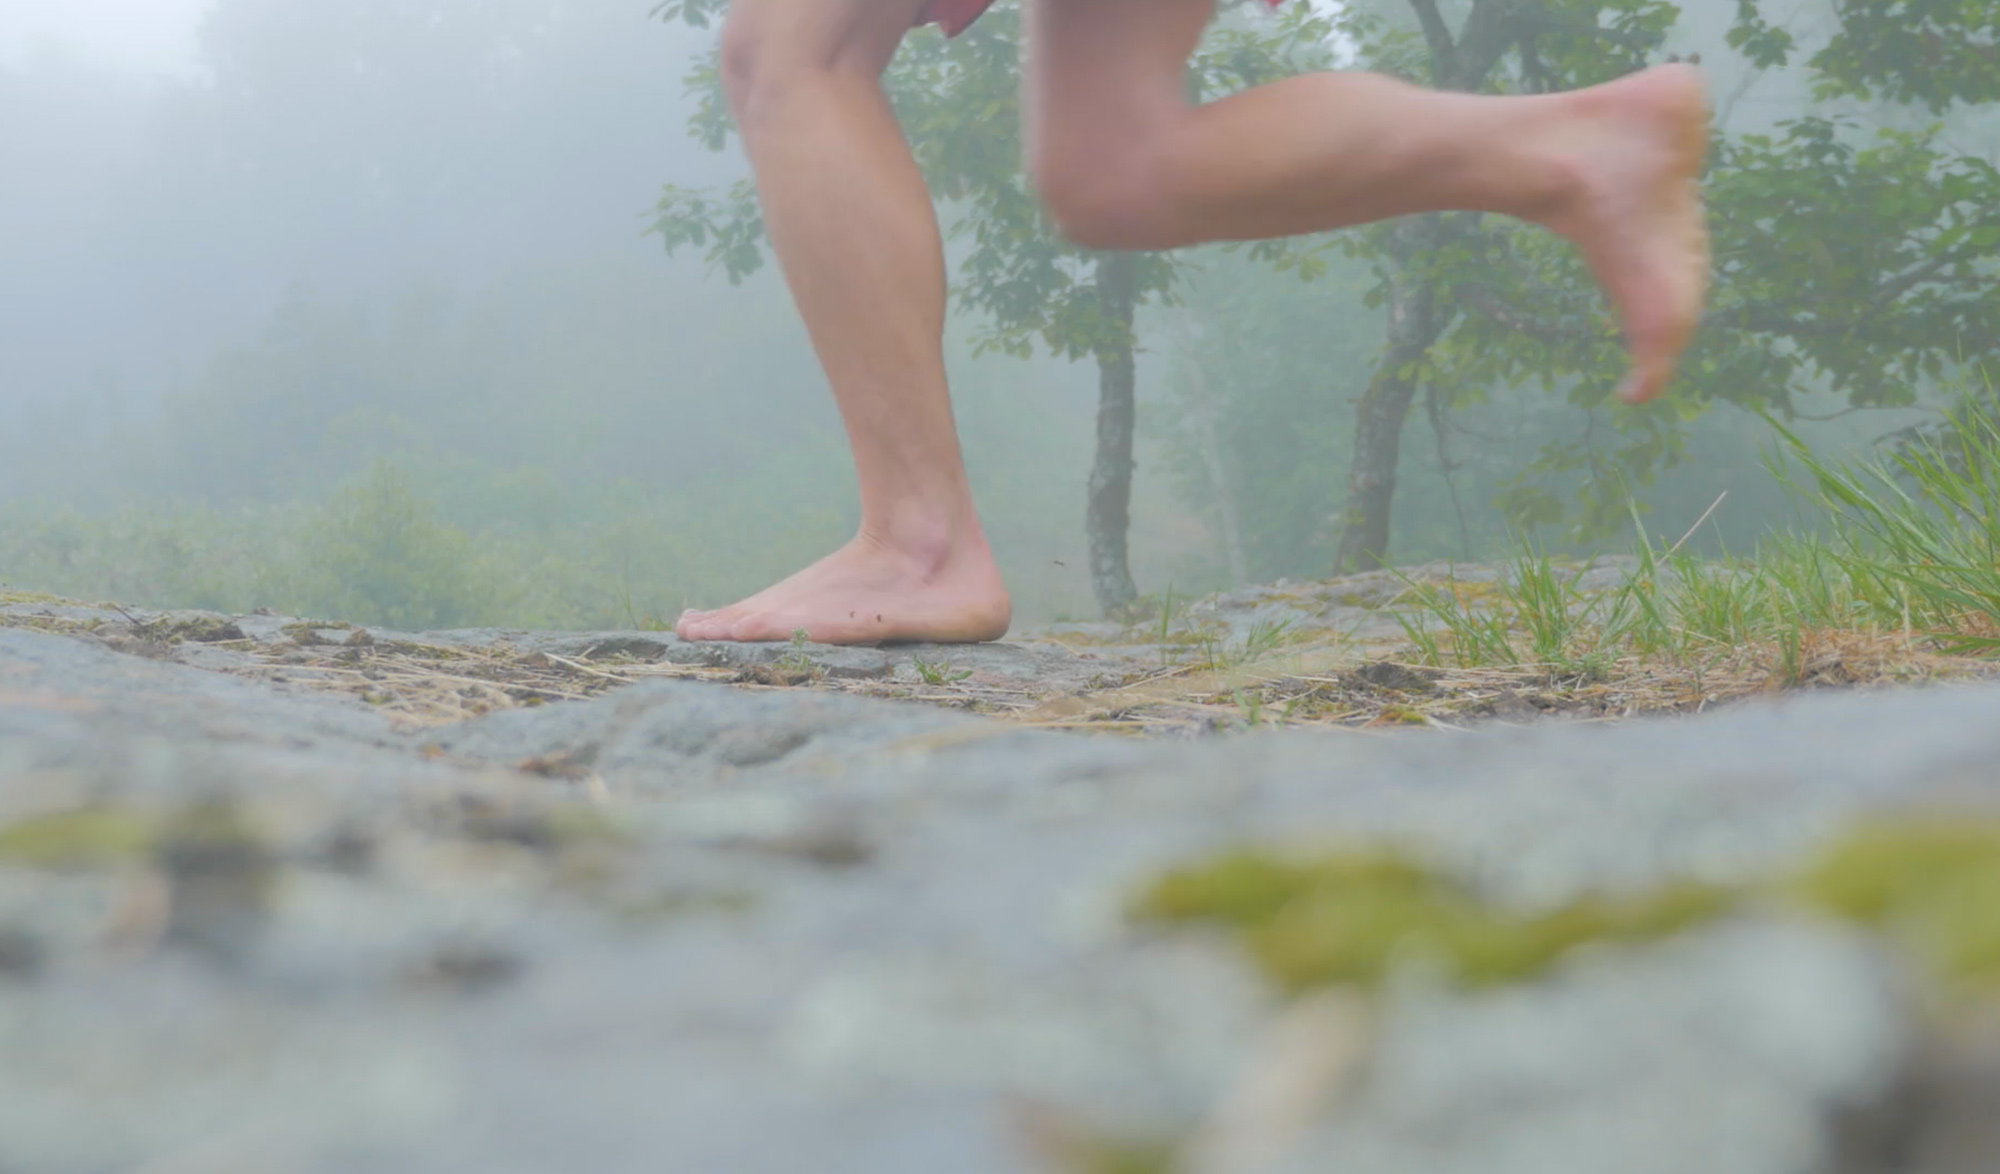 L'empreinte, 3500km pieds nus à travers l'Europe